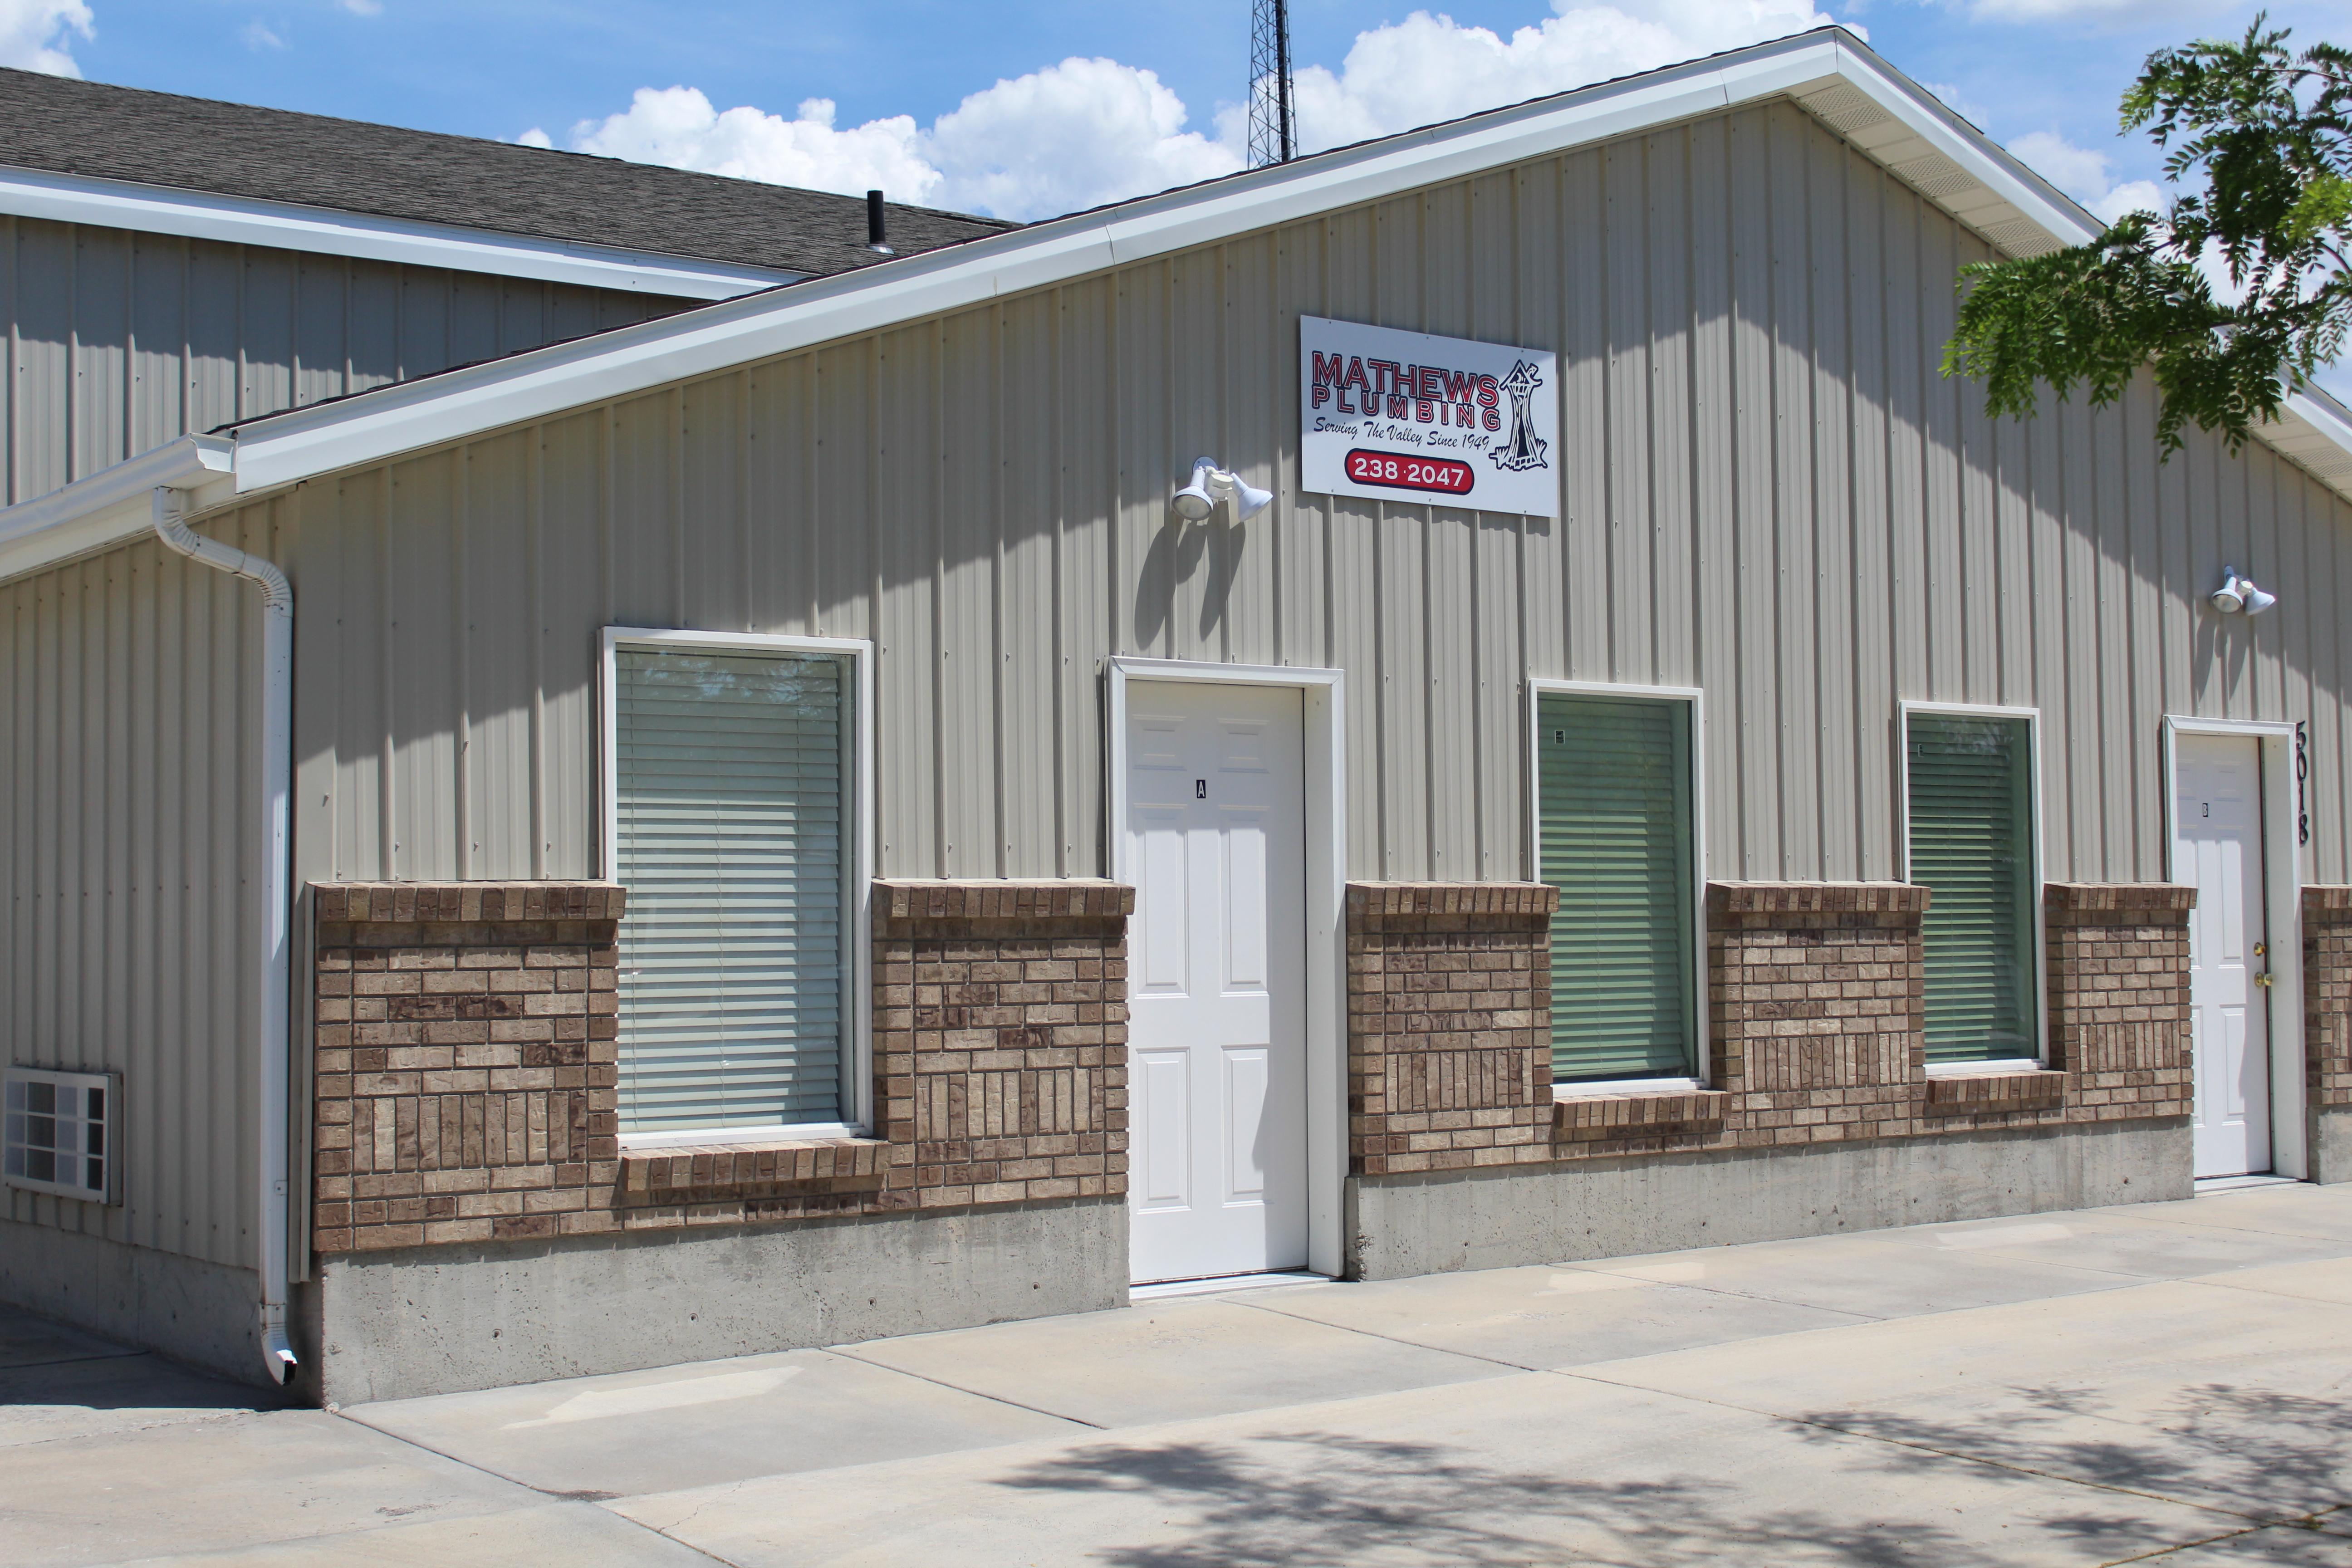 Mathew's Plumbing Idaho Falls plumber Office